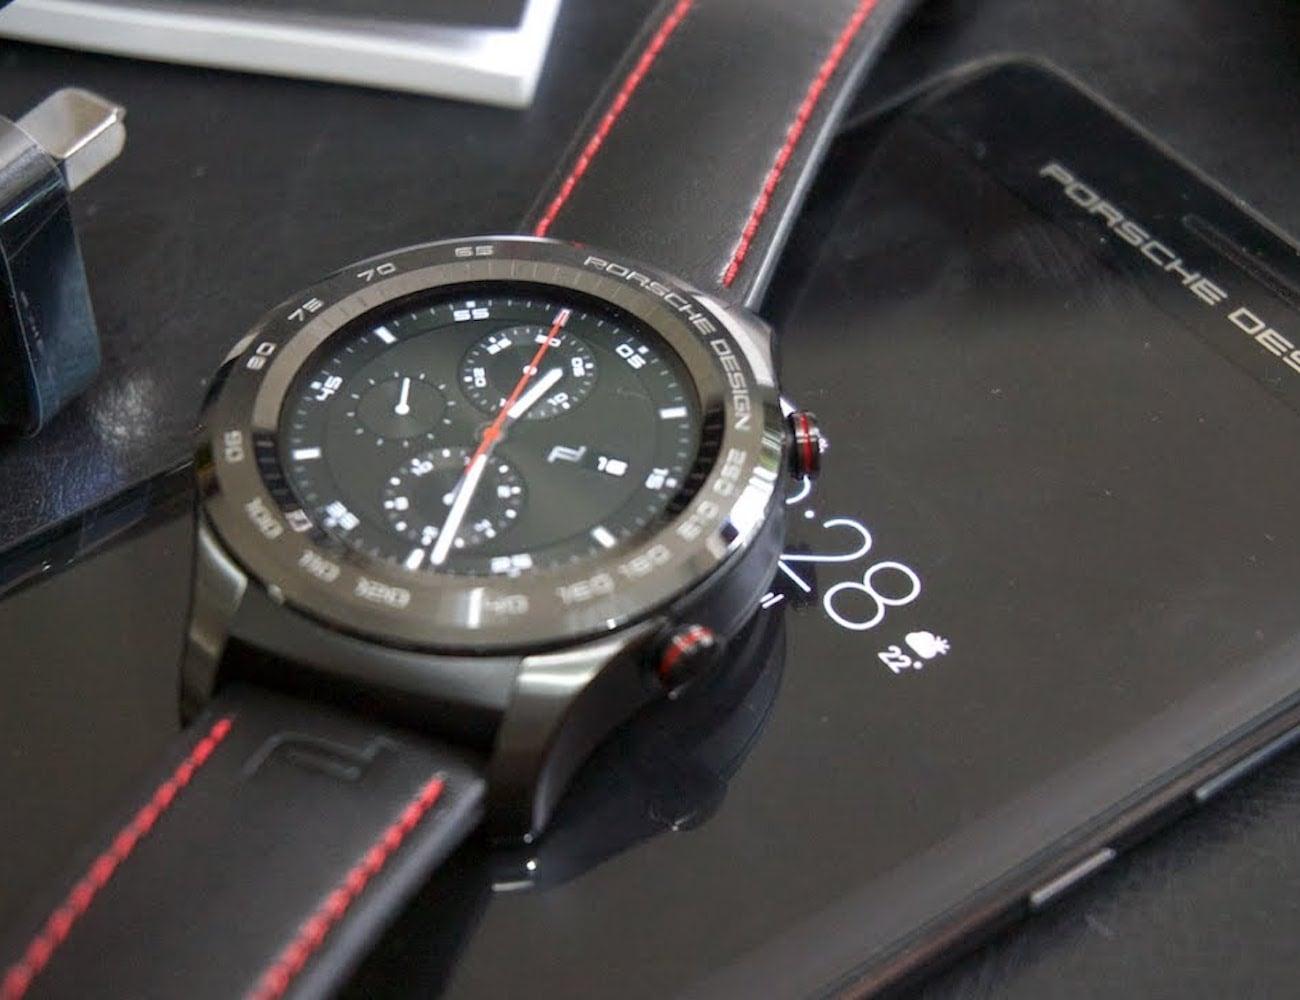 Porsche+Design+X+Huawei+Smartwatch